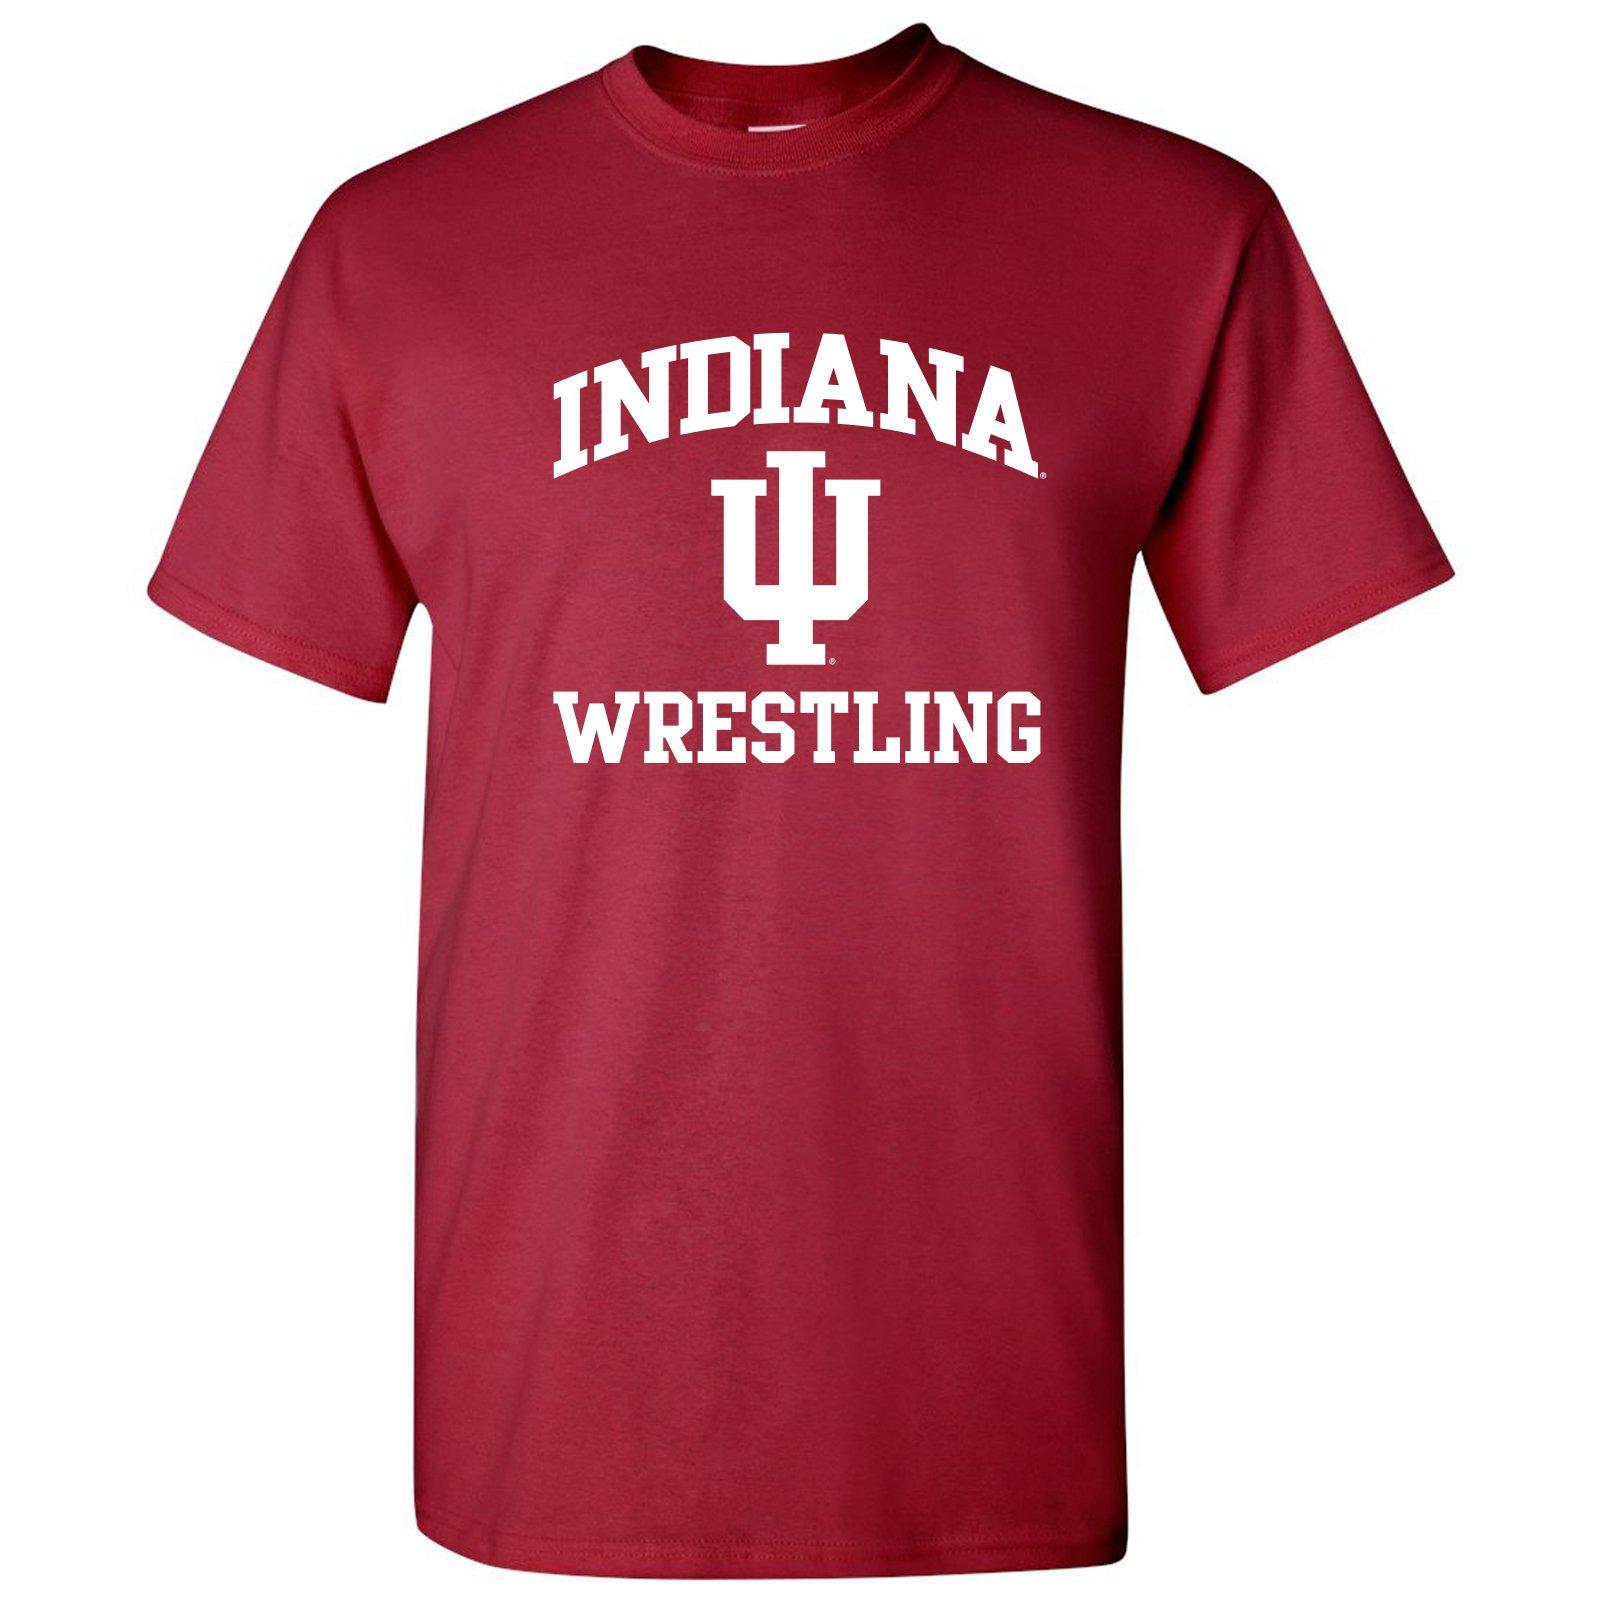 UGP Campus Apparel AS1104 - Indiana Hoosiers Arch Logo Wrestling T-Shirt - Medium - Cardinal